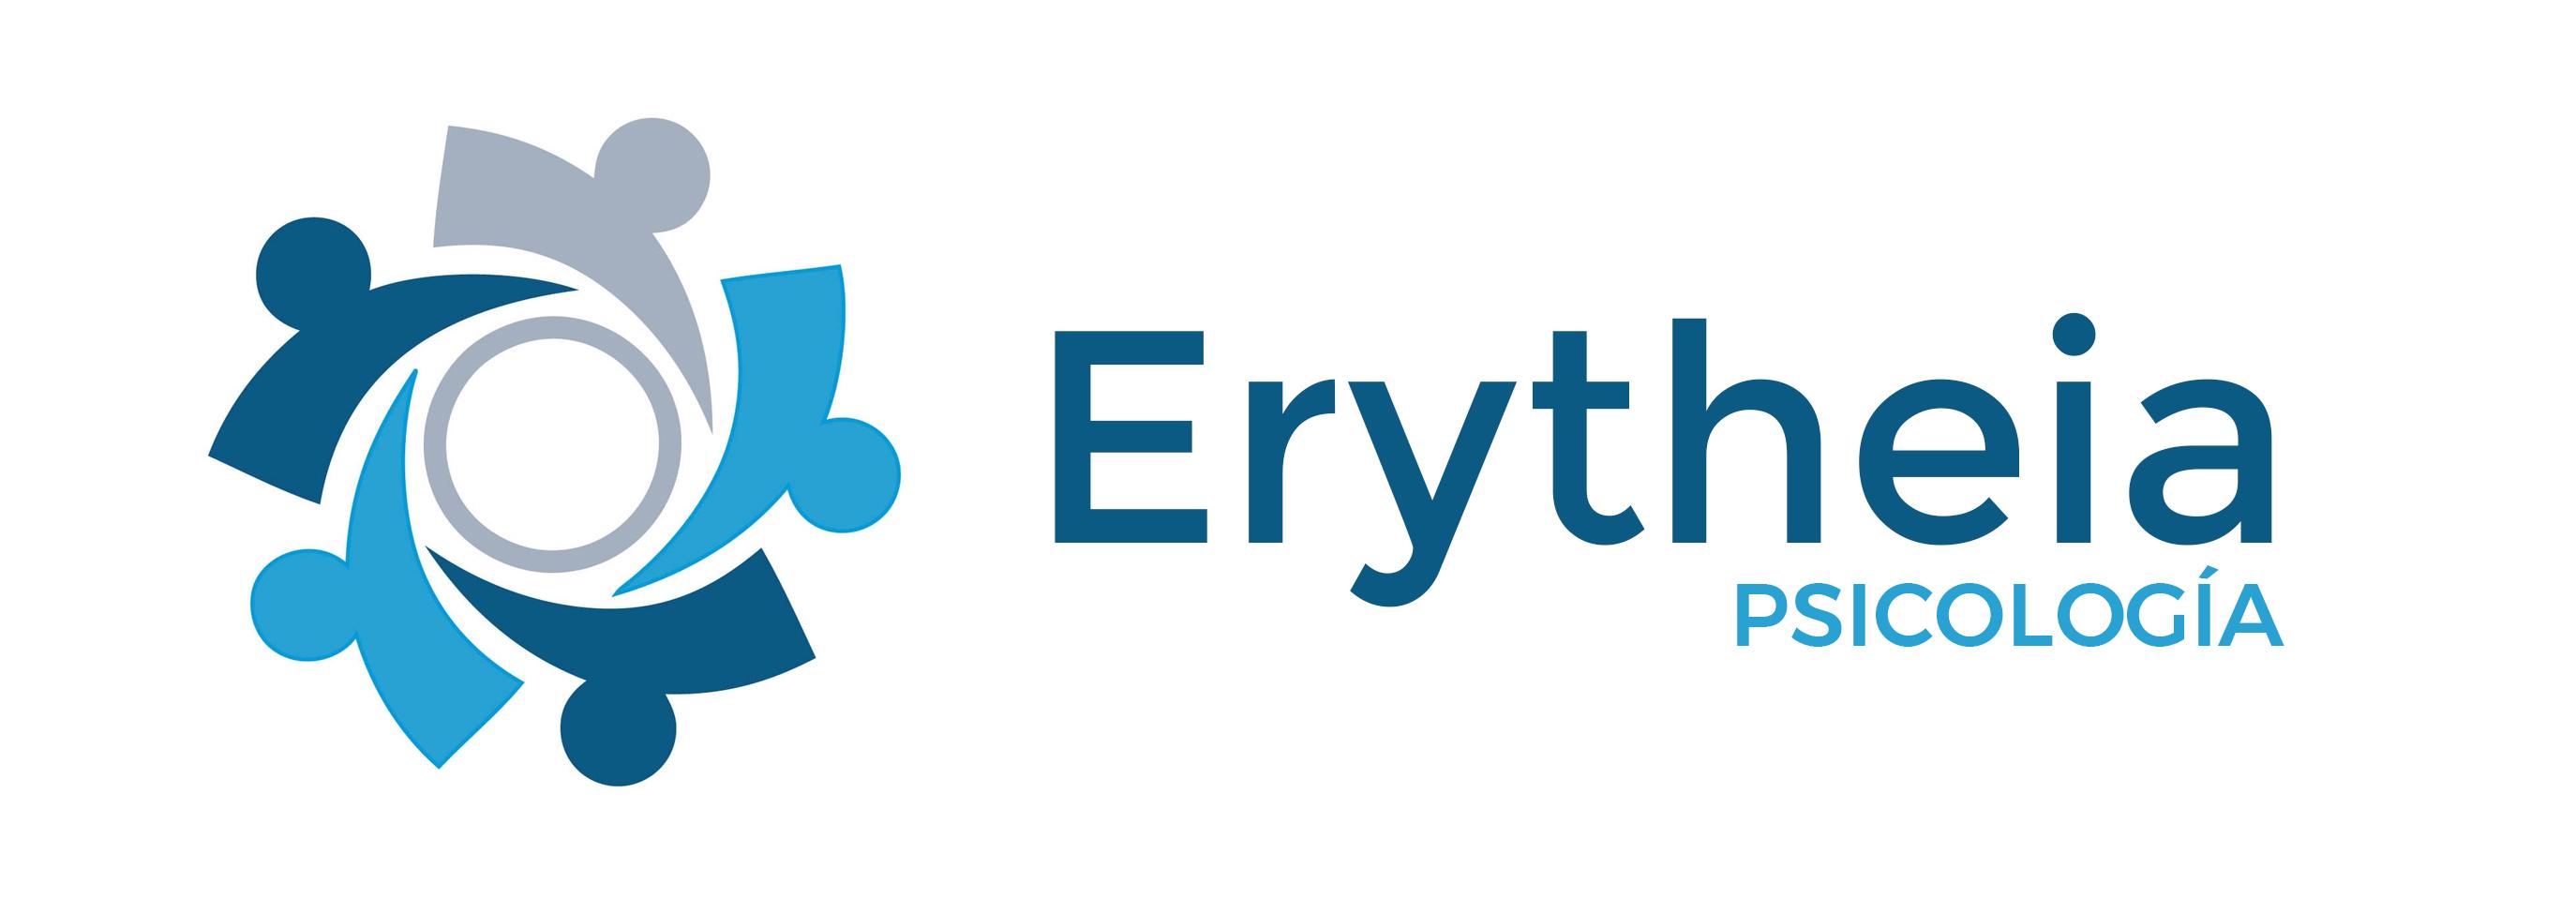 Erytheia Psicología